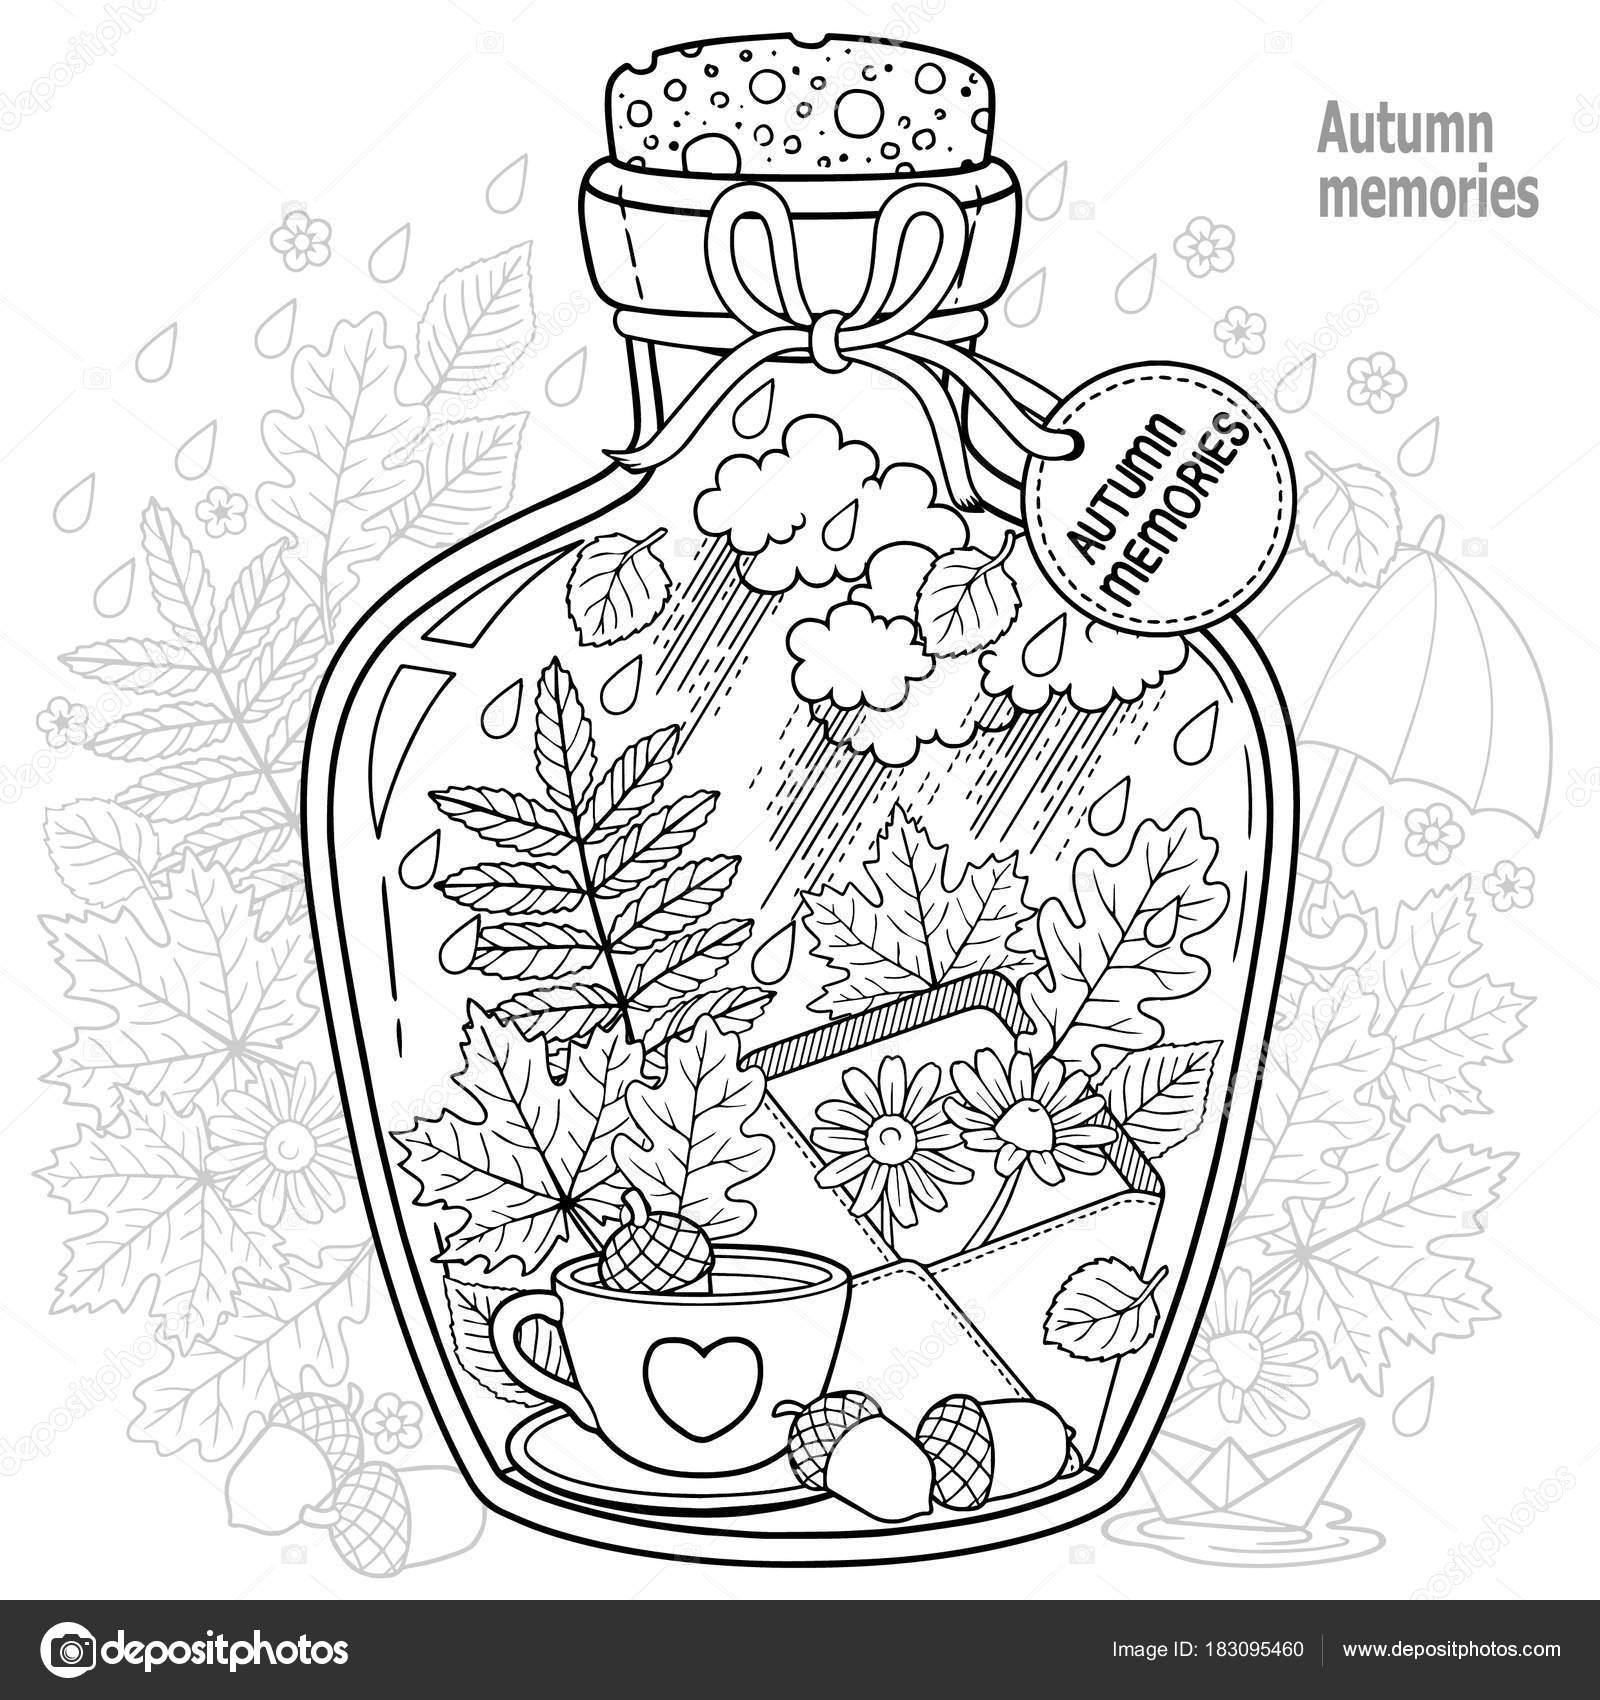 Volwassen Kleurplaat Person ベクトルの大人のための塗り絵 秋との愛の思い出のガラス容器 秋の紅葉 コーヒーや紅茶のカップ 花と悲しい気分の